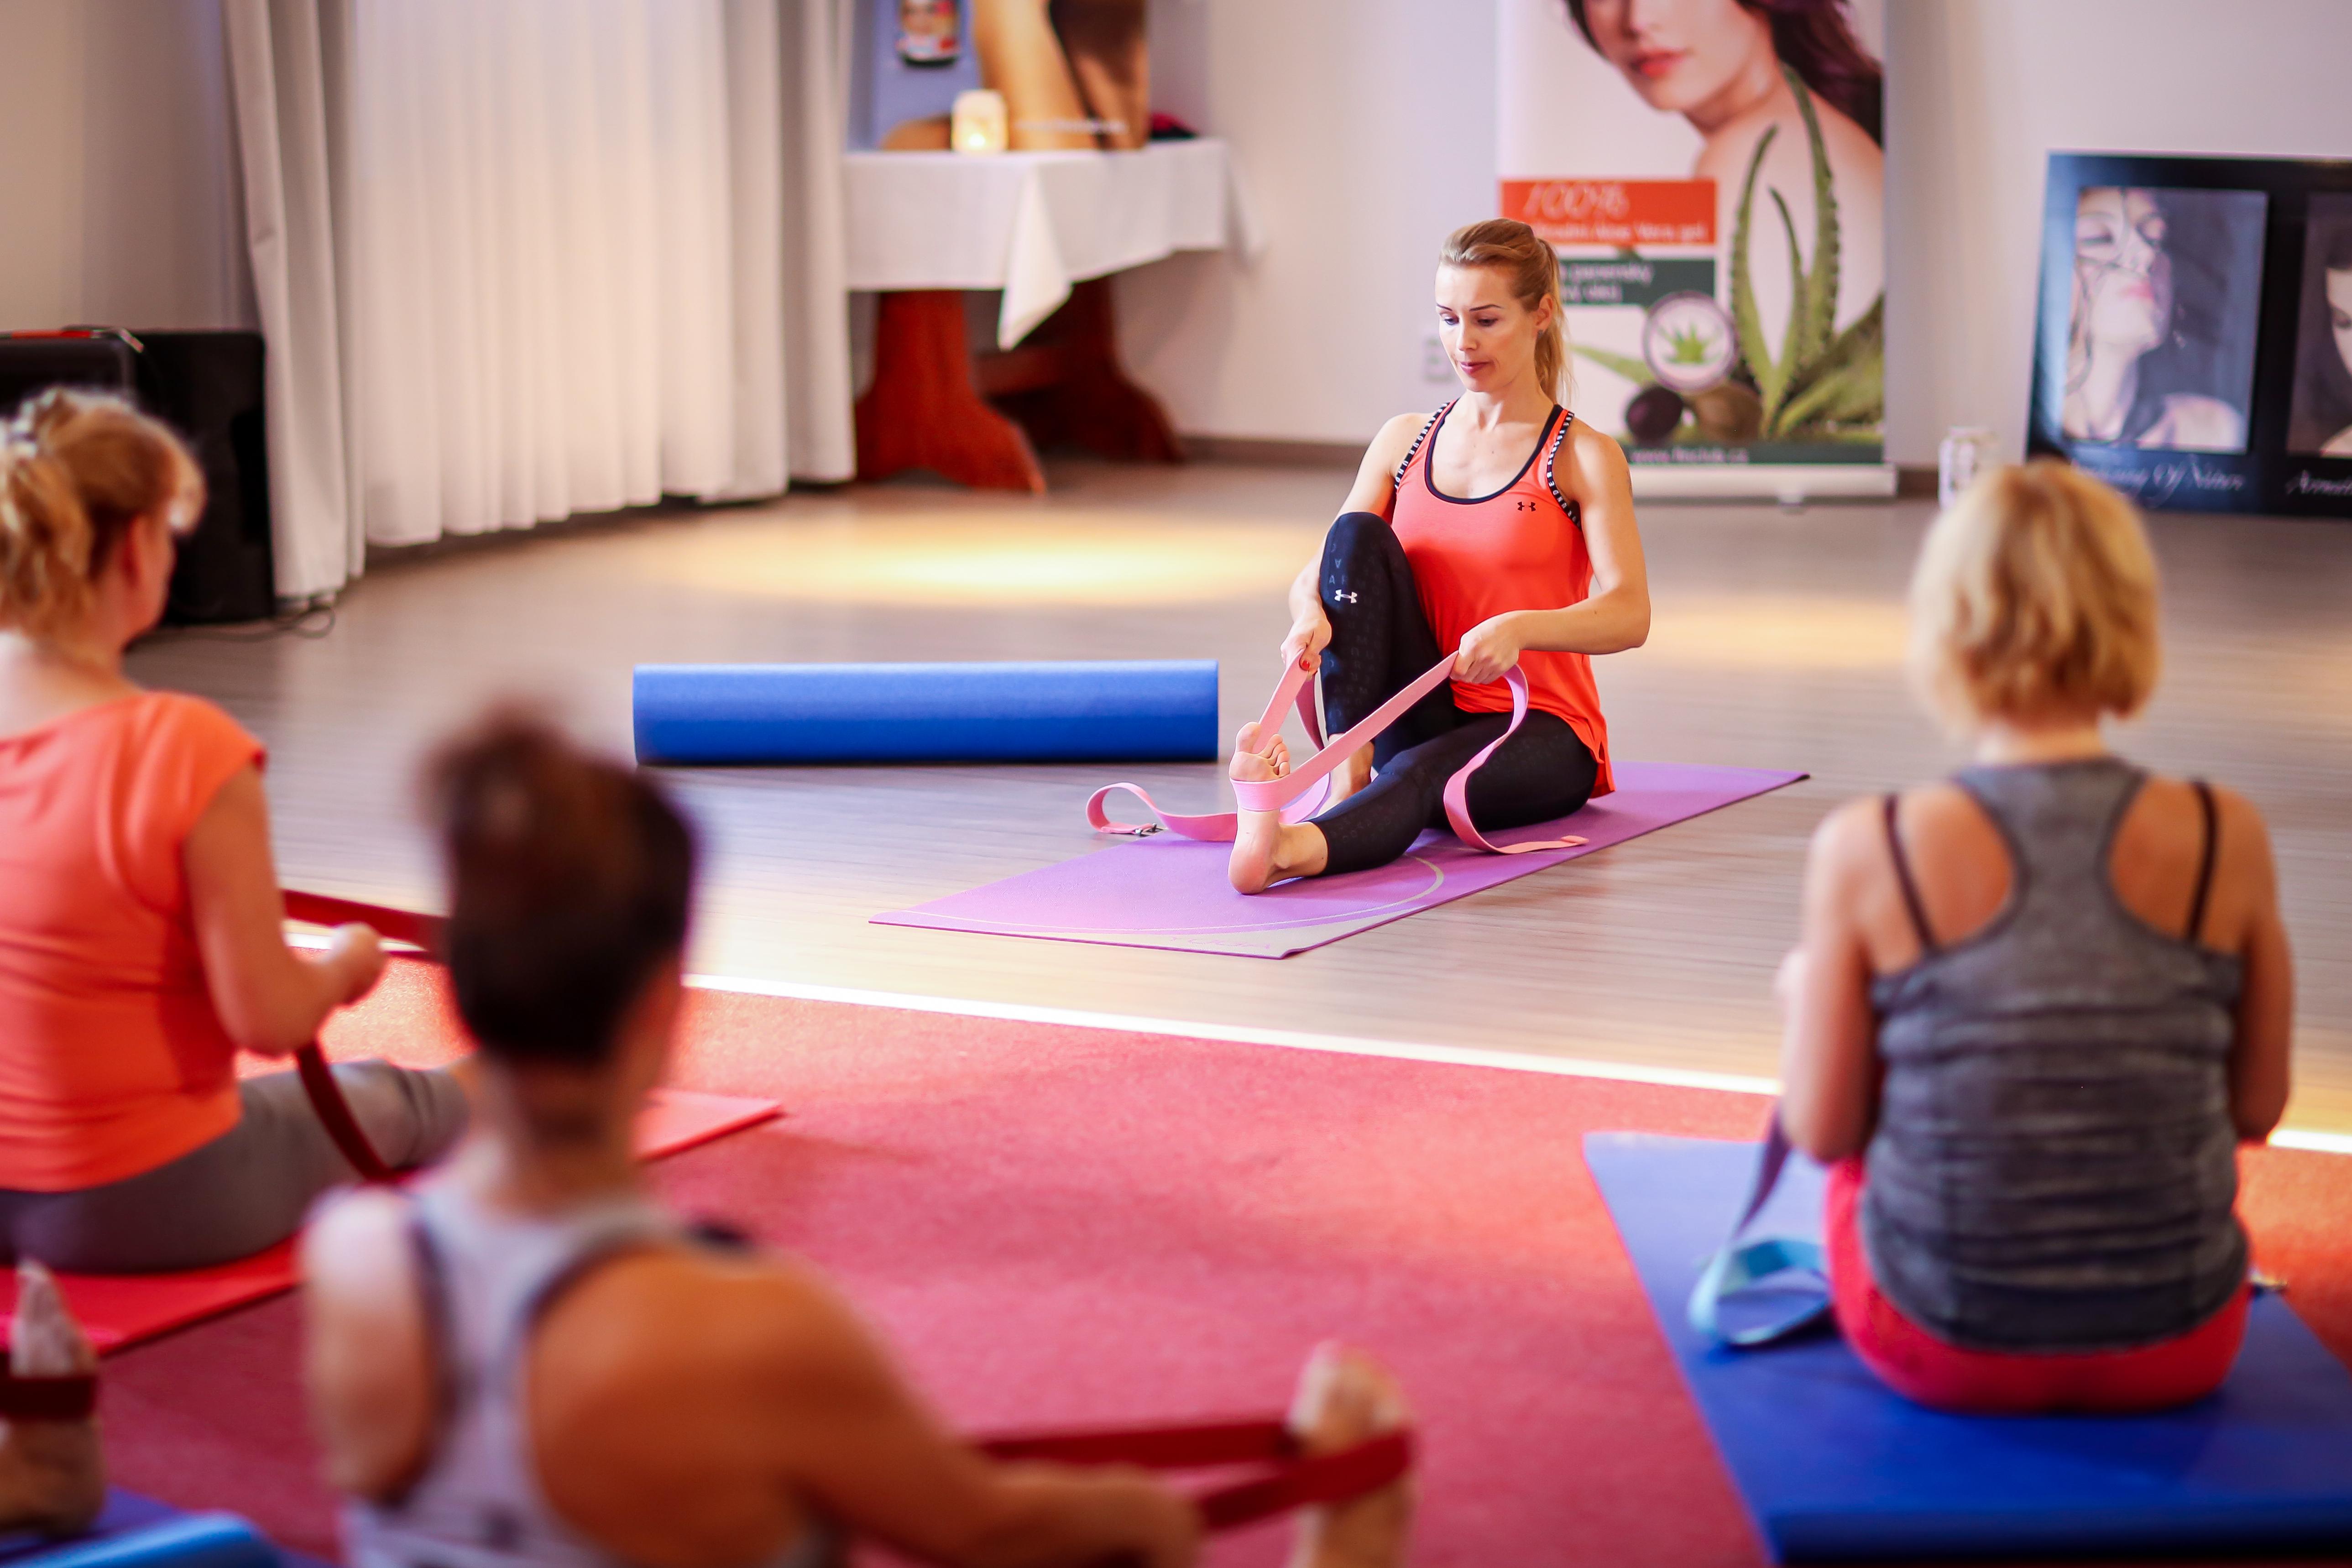 cviceni-relaxace-meditace-wellness-kosmetika-harmonieteladuse